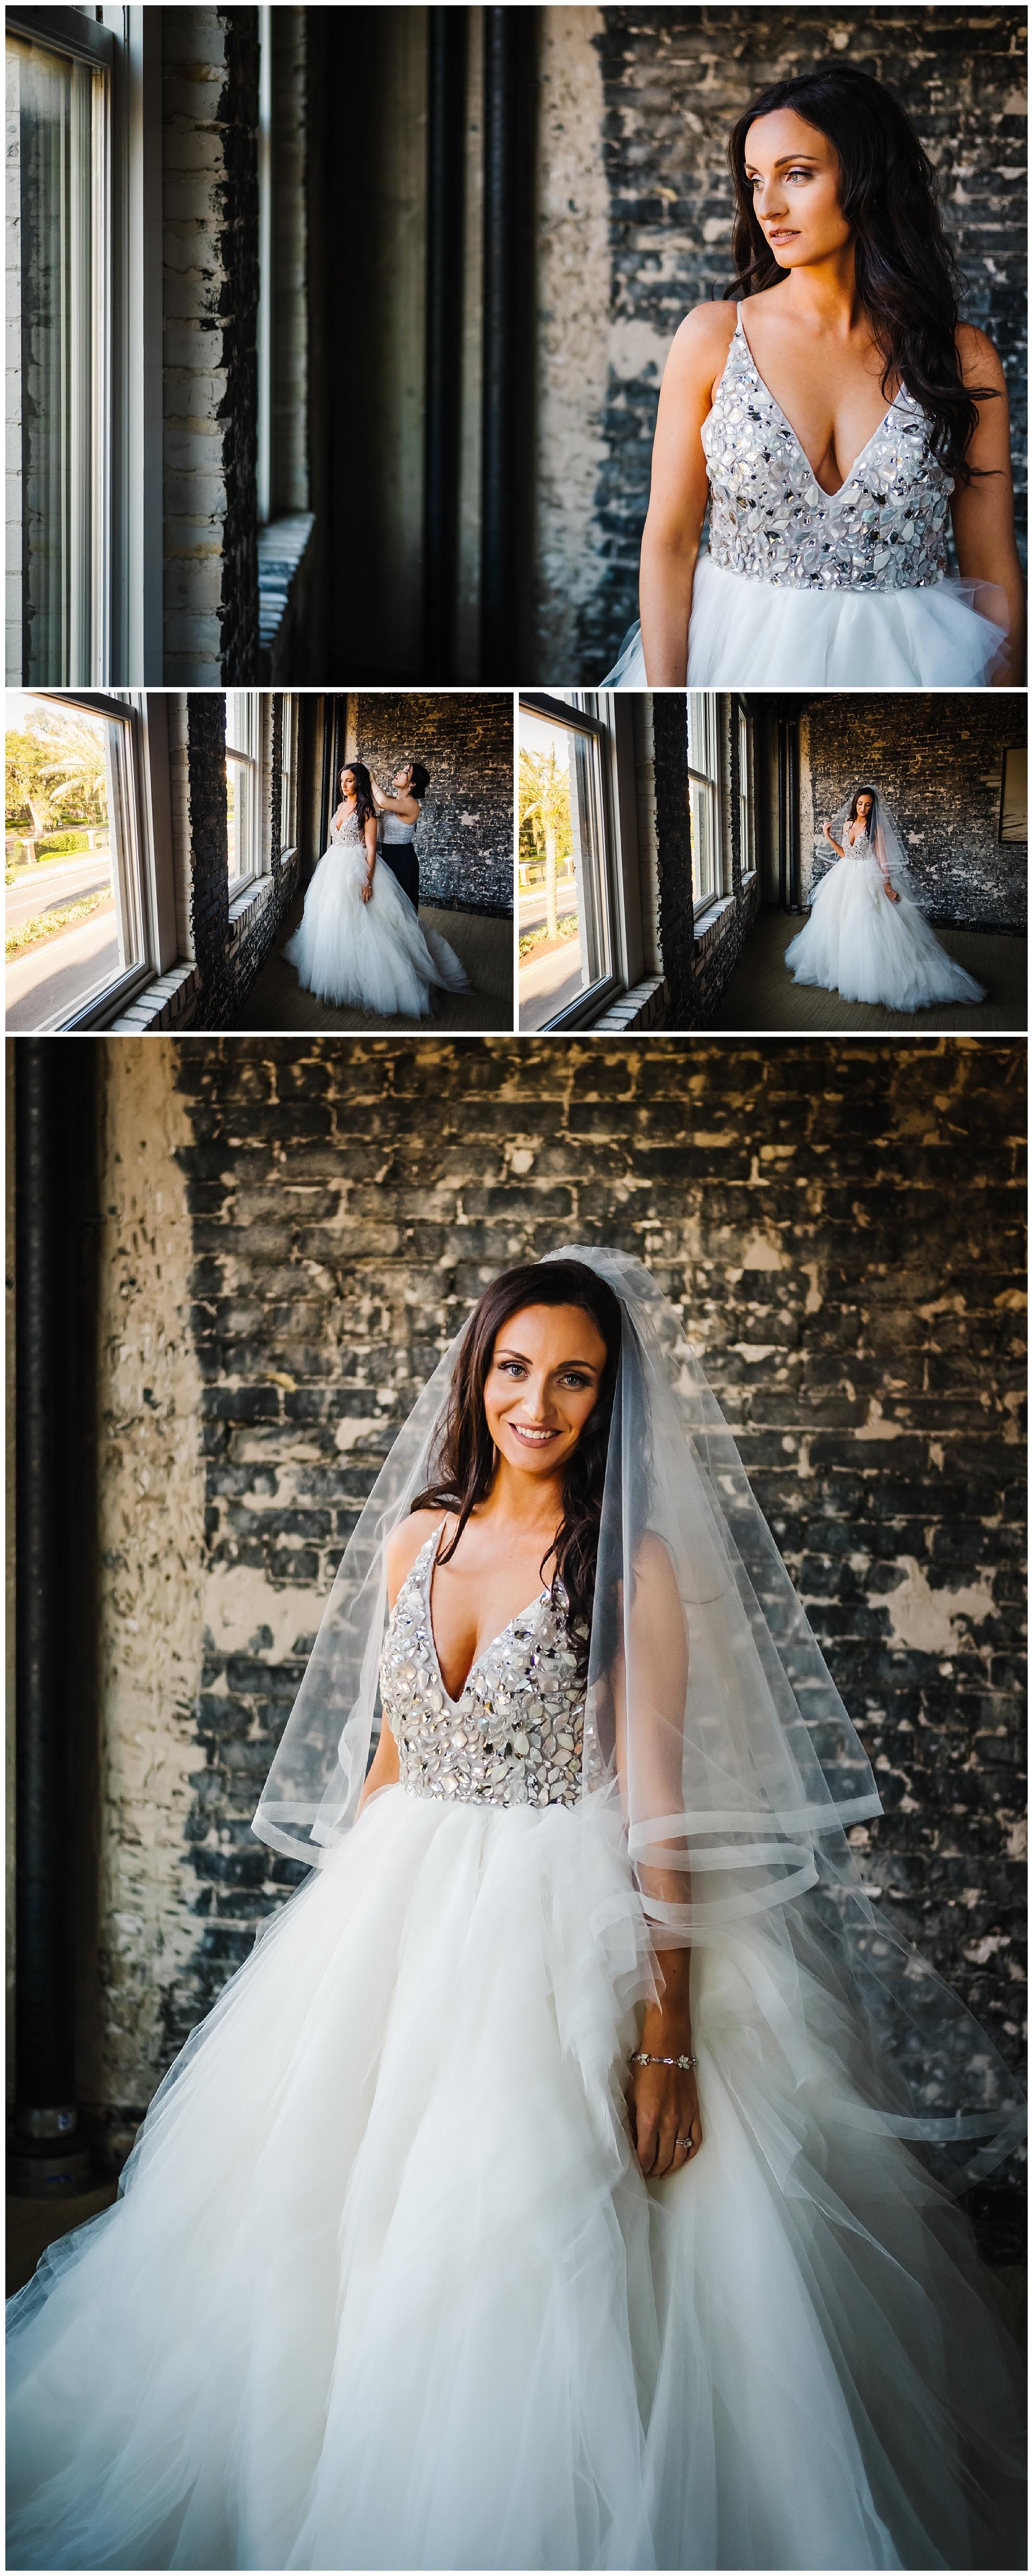 tampa-wedding-photographer-oxford-exchange-garland-candlelight-gold-hayley-paige_0013.jpg